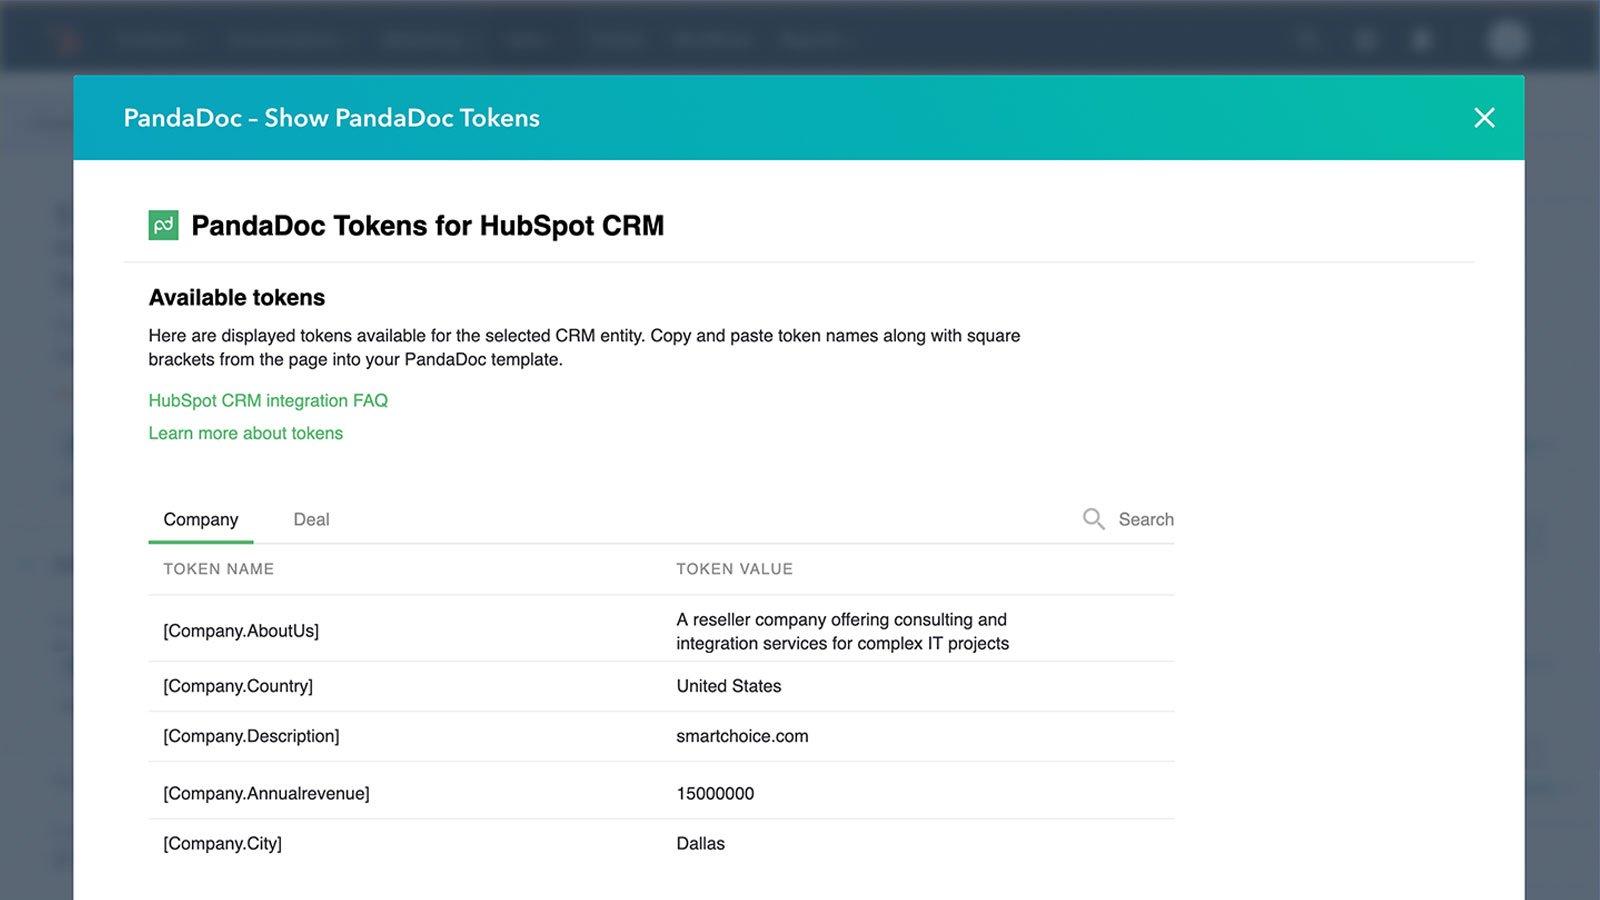 Use HubSpot CRM Data